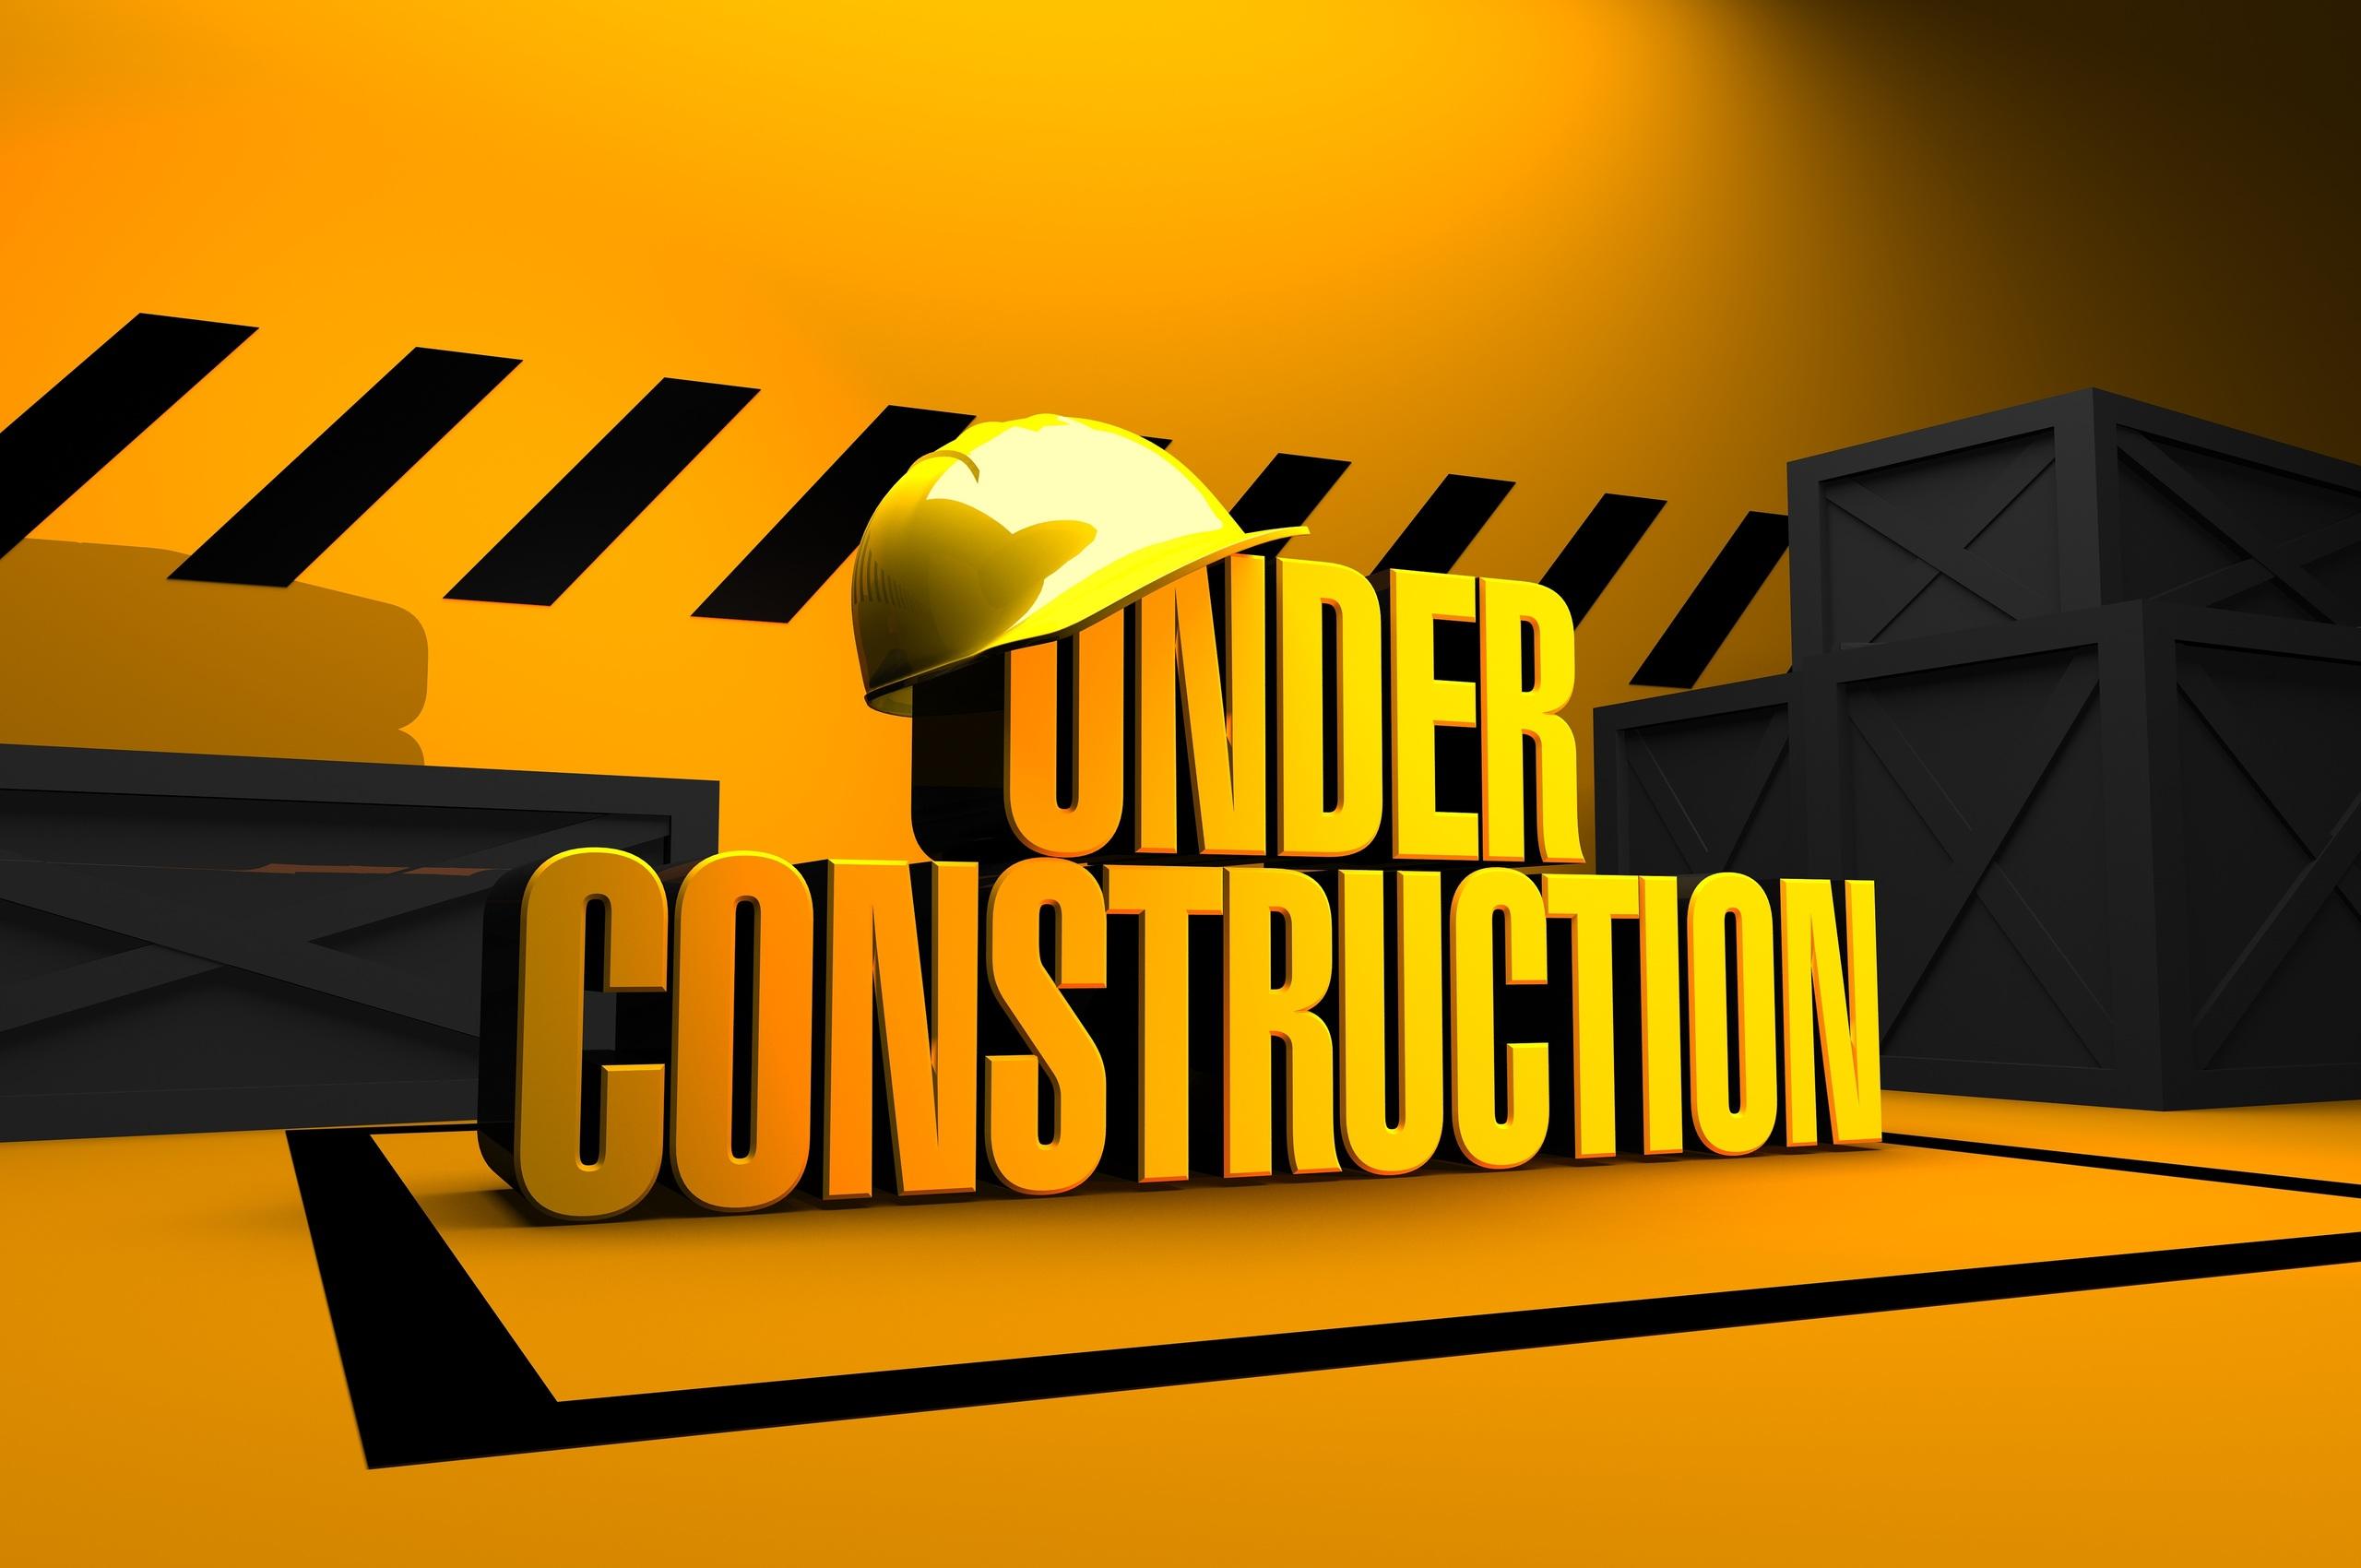 2560x1700 Under Construction Build Work Architecture